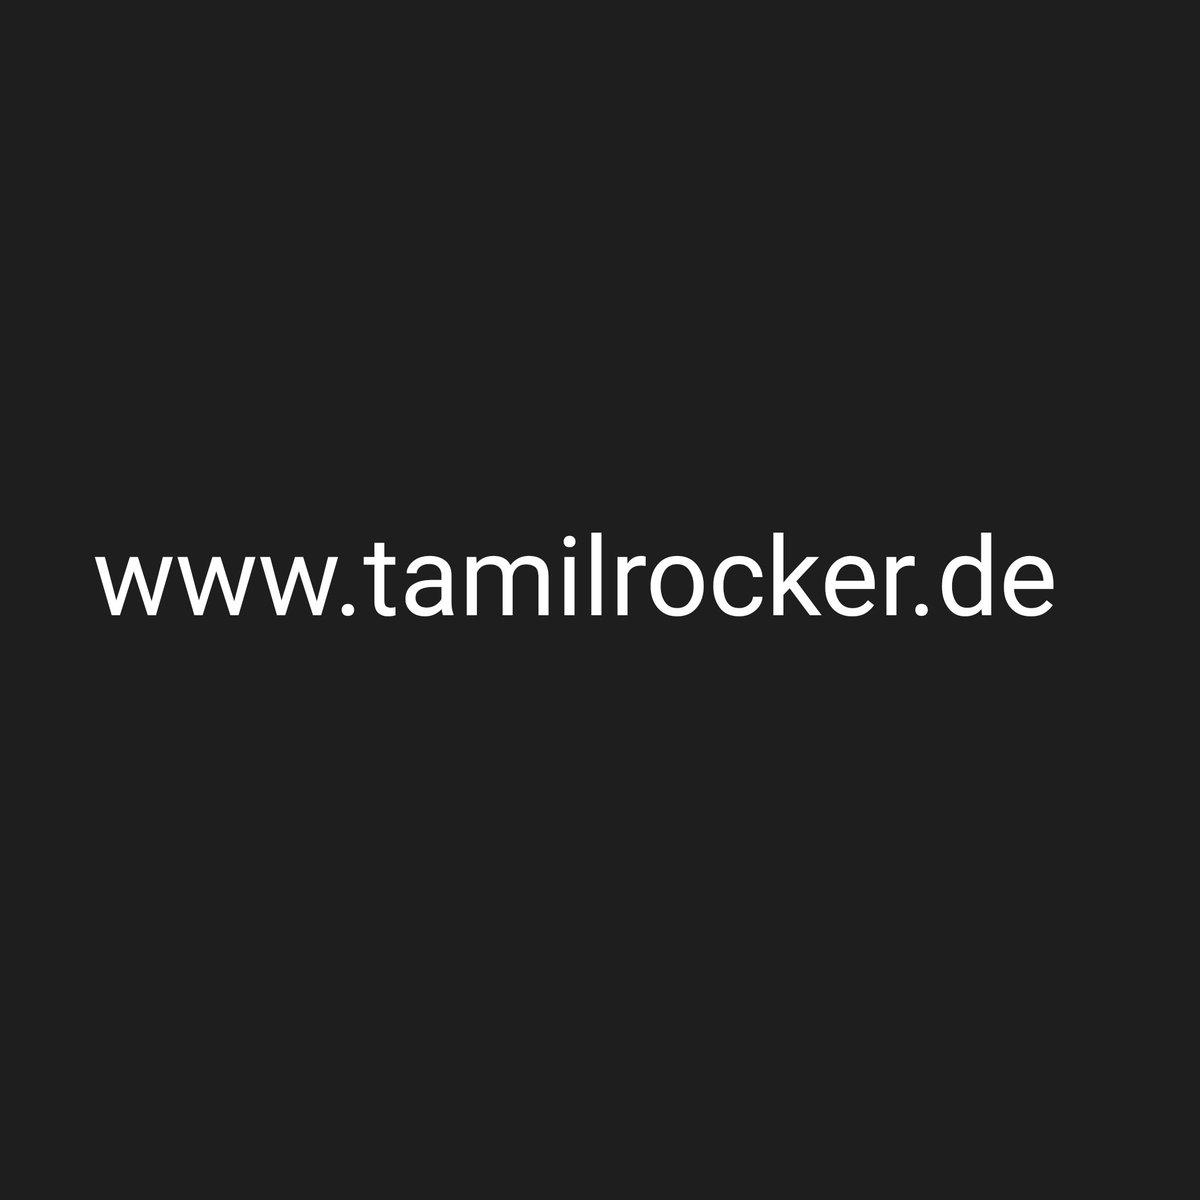 tamil full movie free download in isaimini